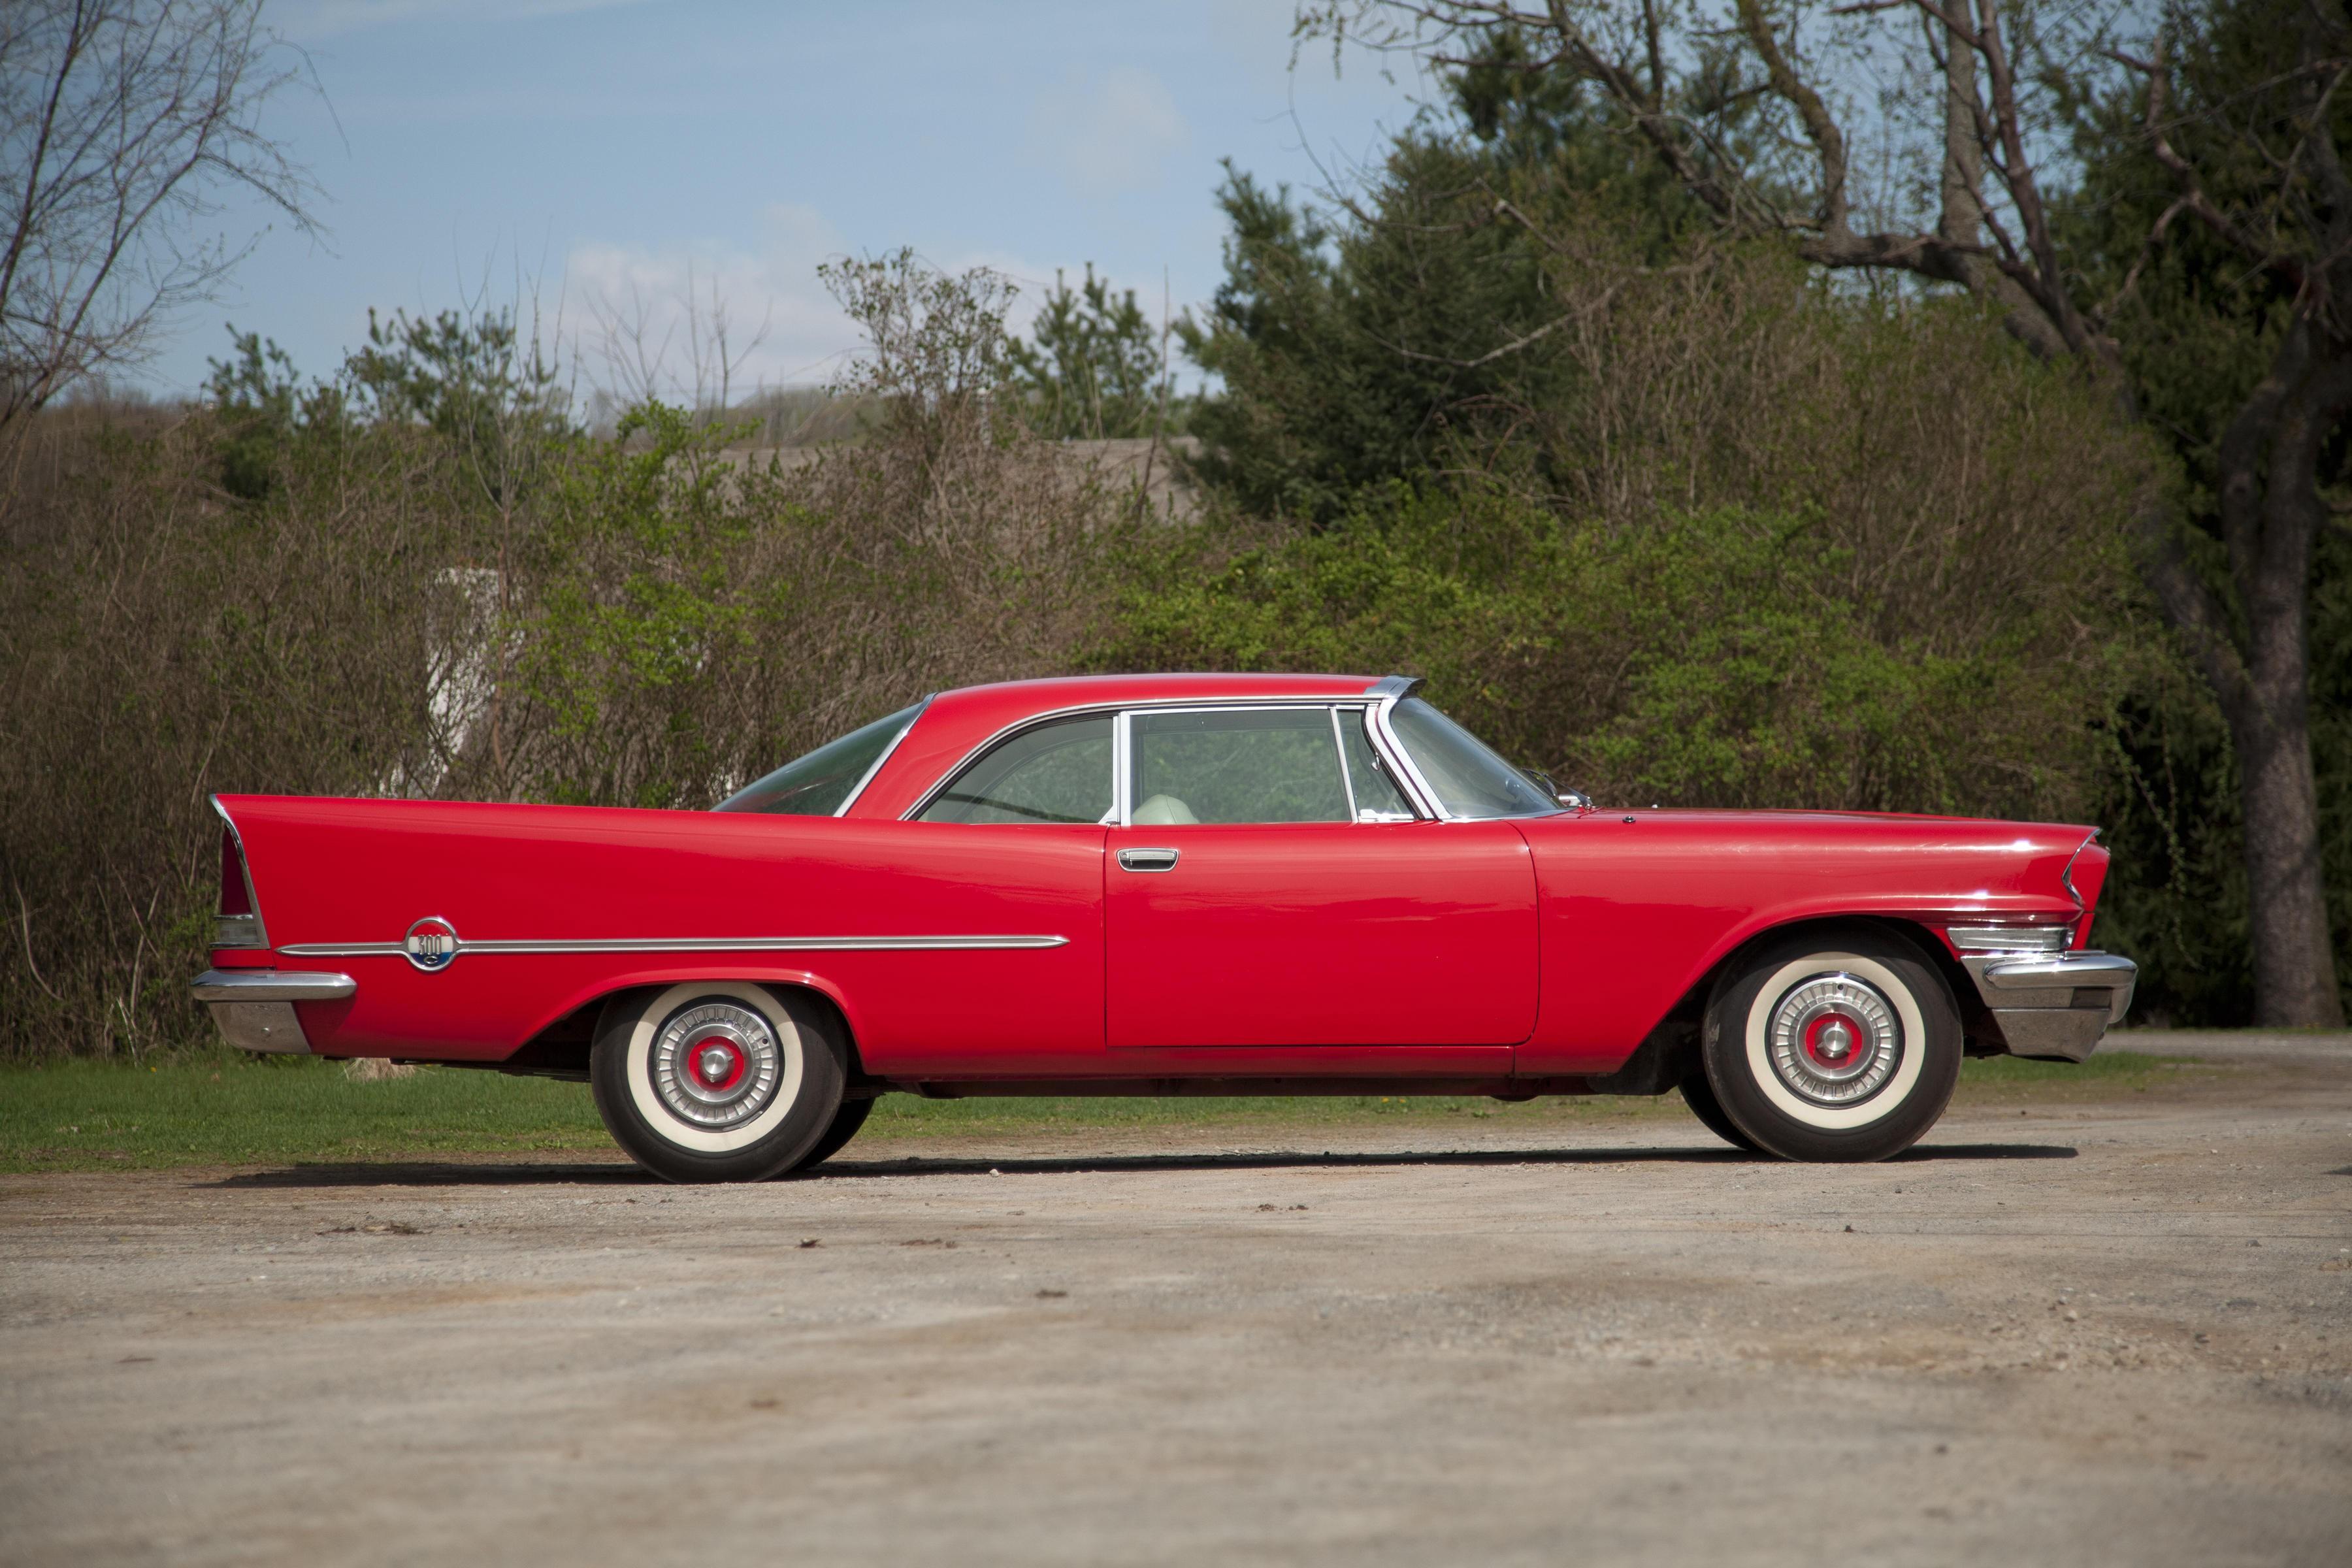 Chrysler 300 Letter Series III (300C) 1957 - 1957 Coupe-Hardtop #5